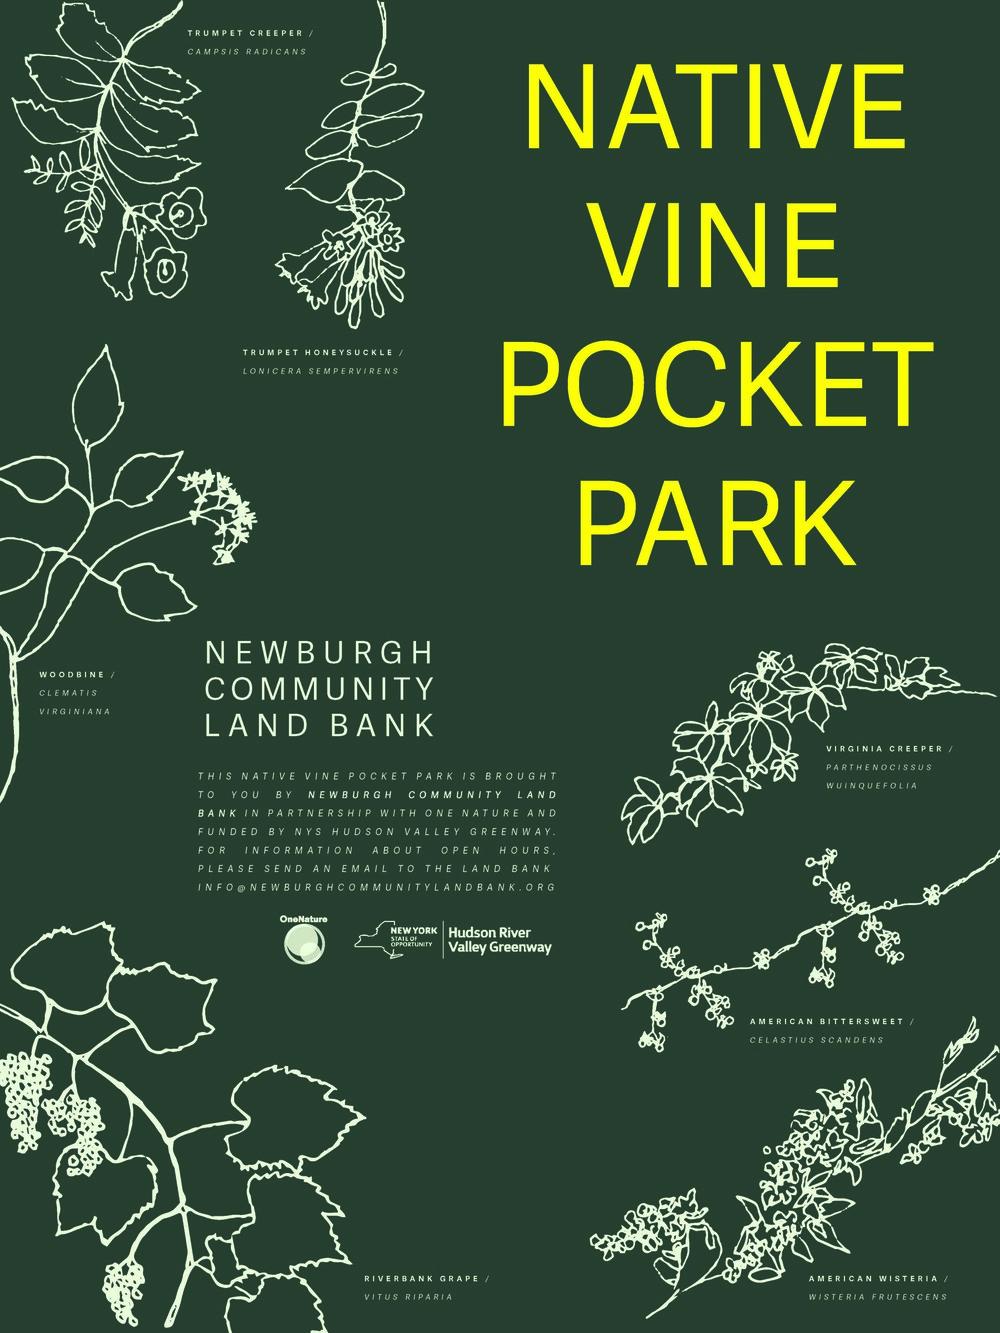 NCLB Pocket Park Signage-1.jpg